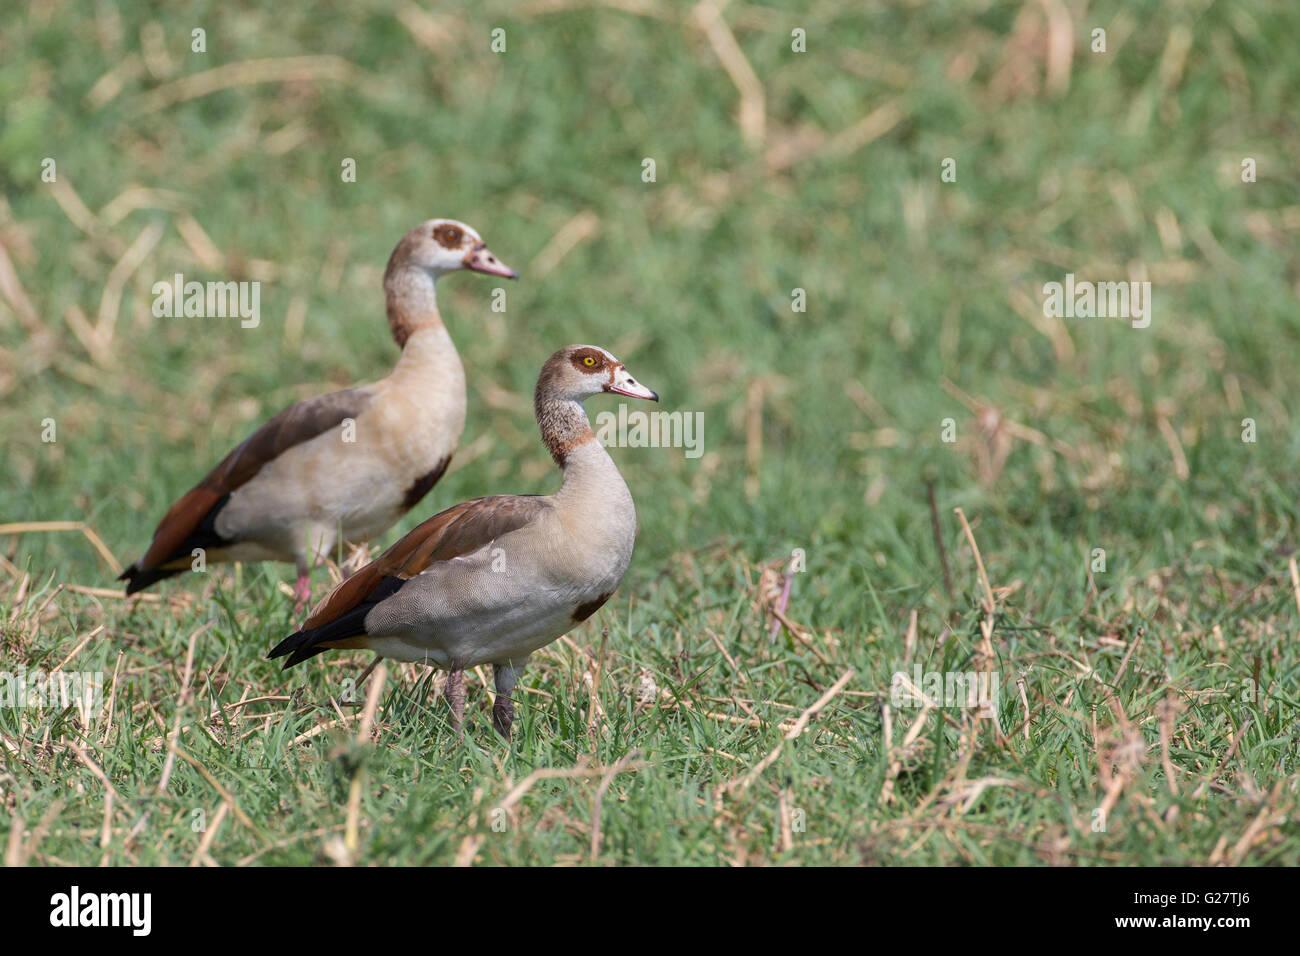 Egyptian Geese (Alopochen aegyptiacus), Botswana - Stock Image